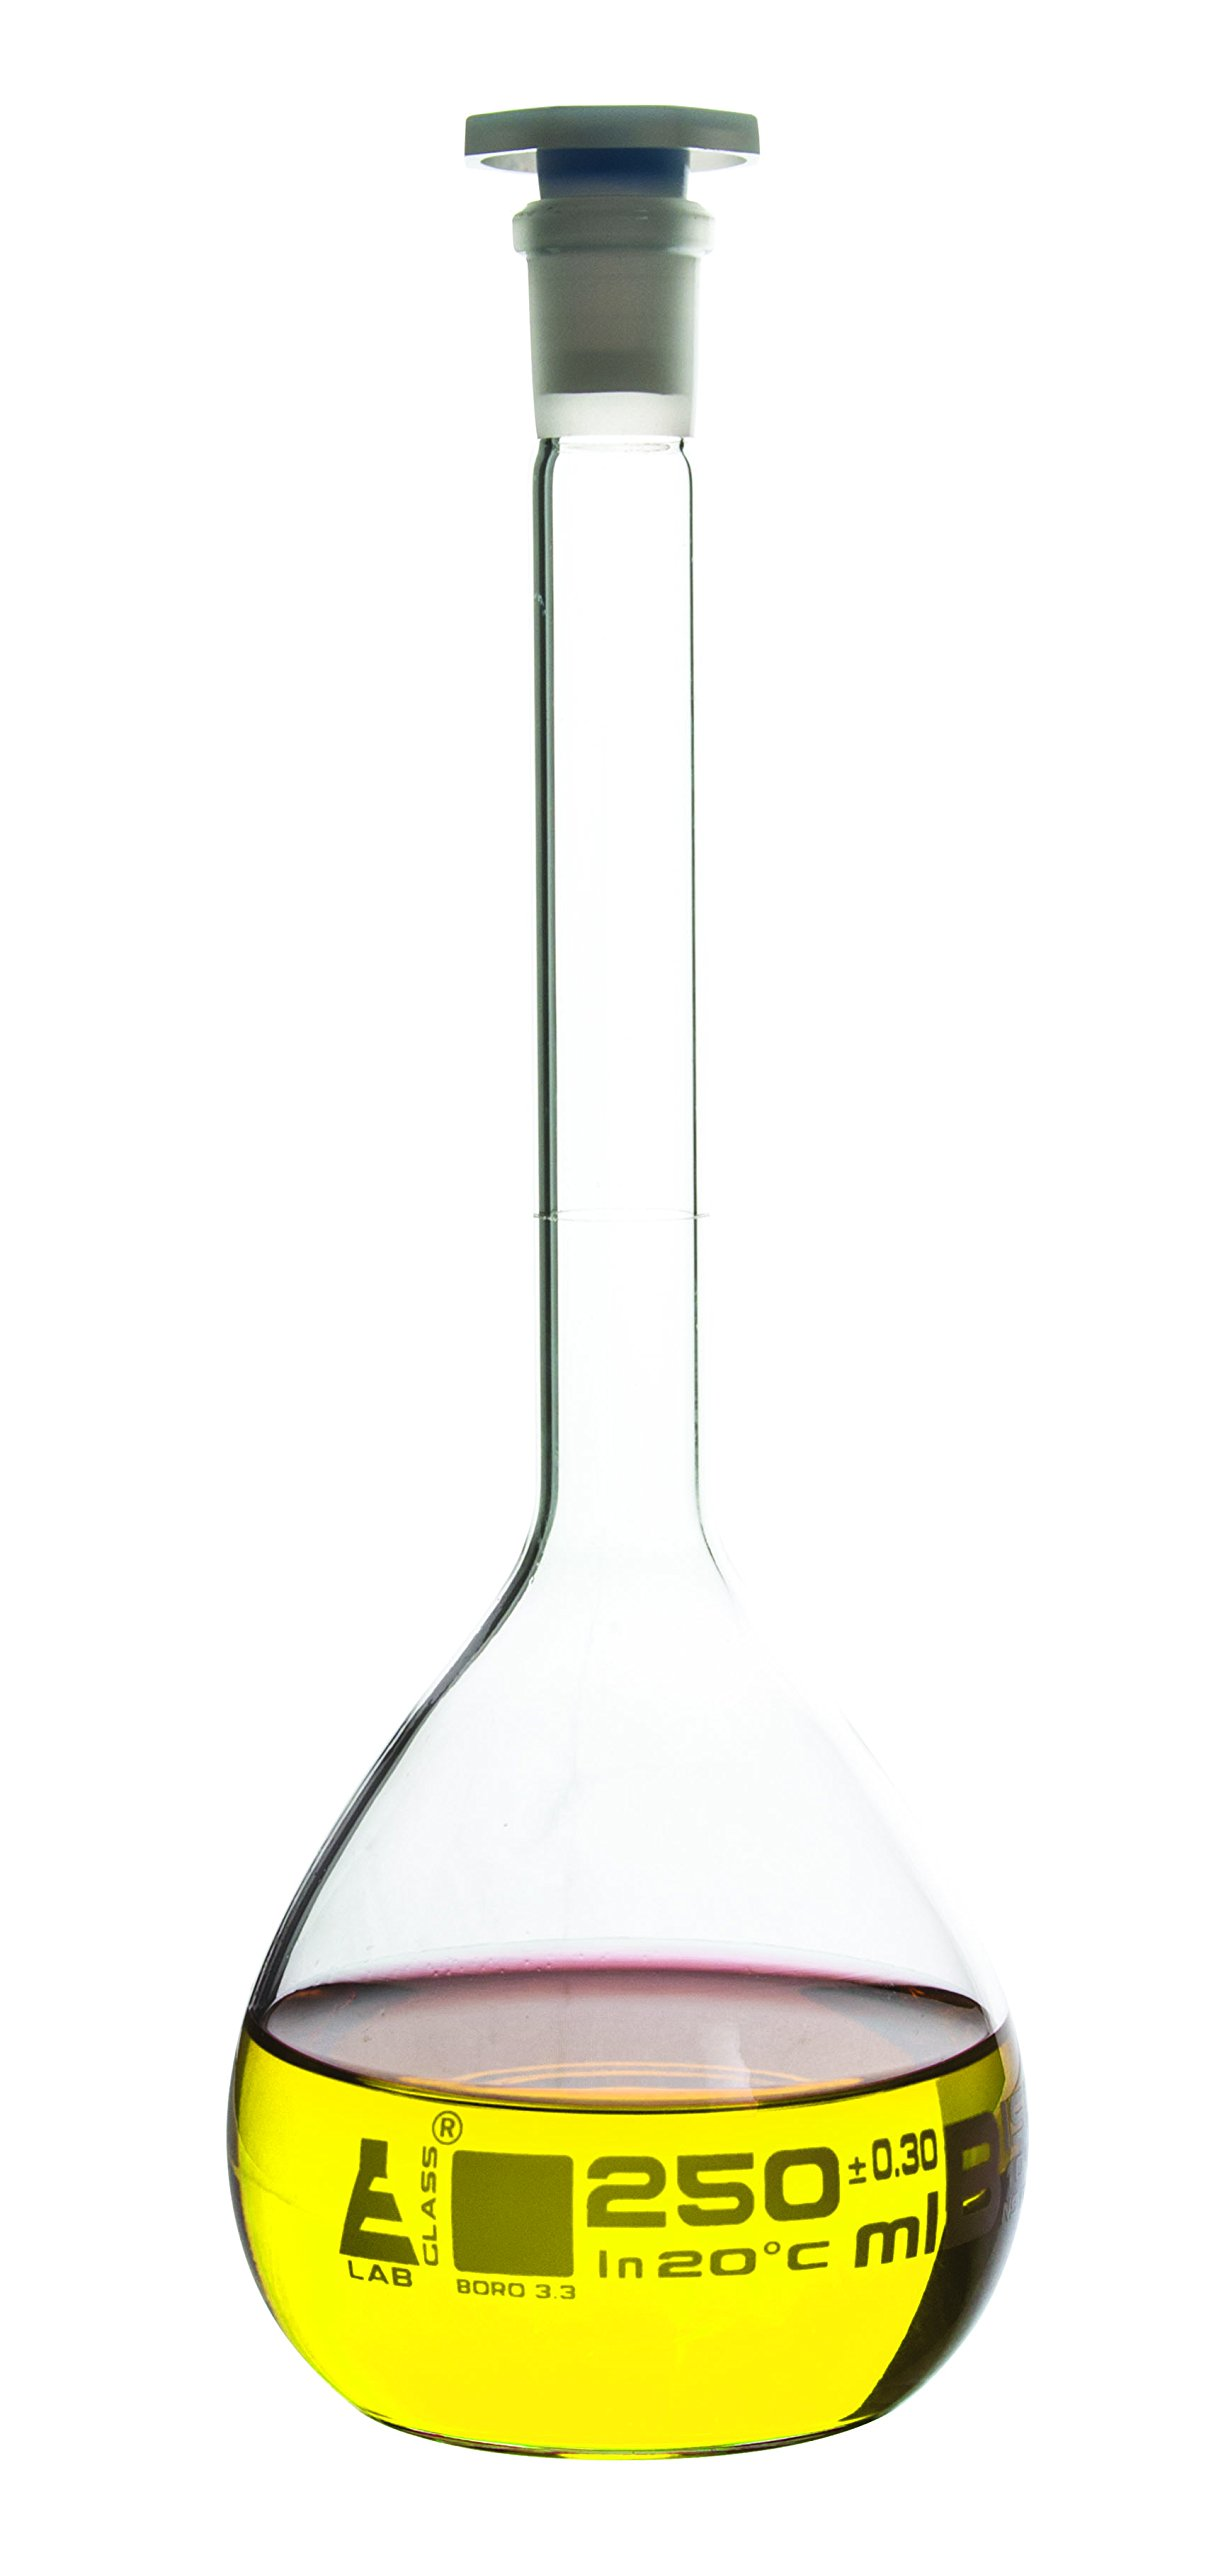 Volumetric Flask, 250ml - Class B - 14/23 Polypropylene Stopper, Borosilicate Glass - Blue Graduation, Tolerance ±0.300 - Eisco Labs by EISCO